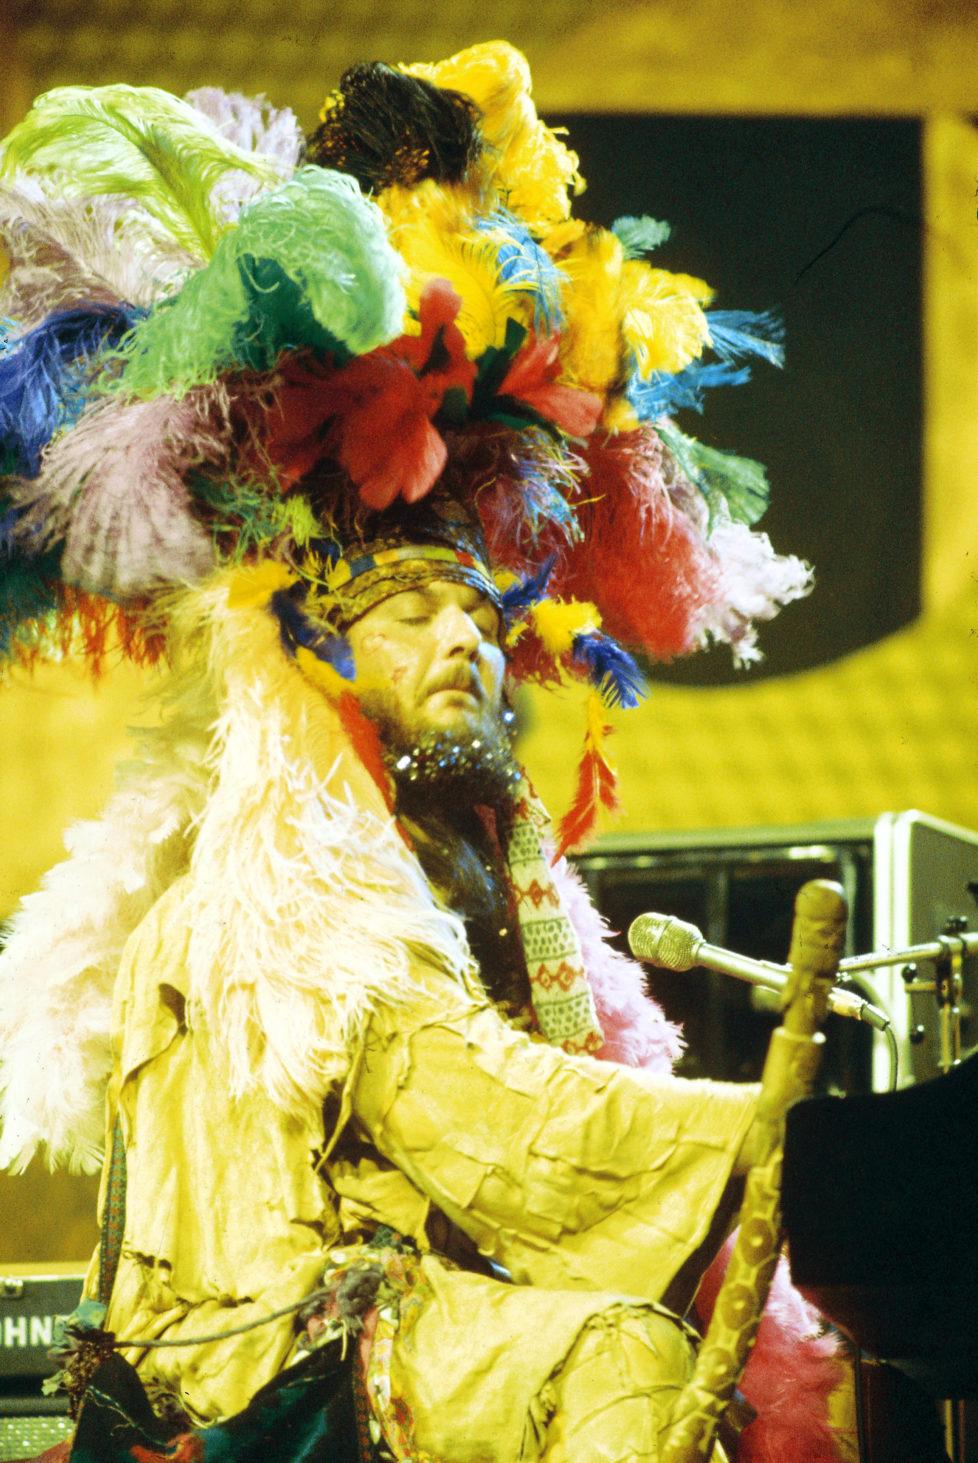 MONTREUX, SWITZERLAND - 1st JULY: American musician Dr. John performs live on stage at the Montreux Jazz Festival in Montreux, Switzerland in July 1973. (Photo by David Warner Ellis/Redferns)